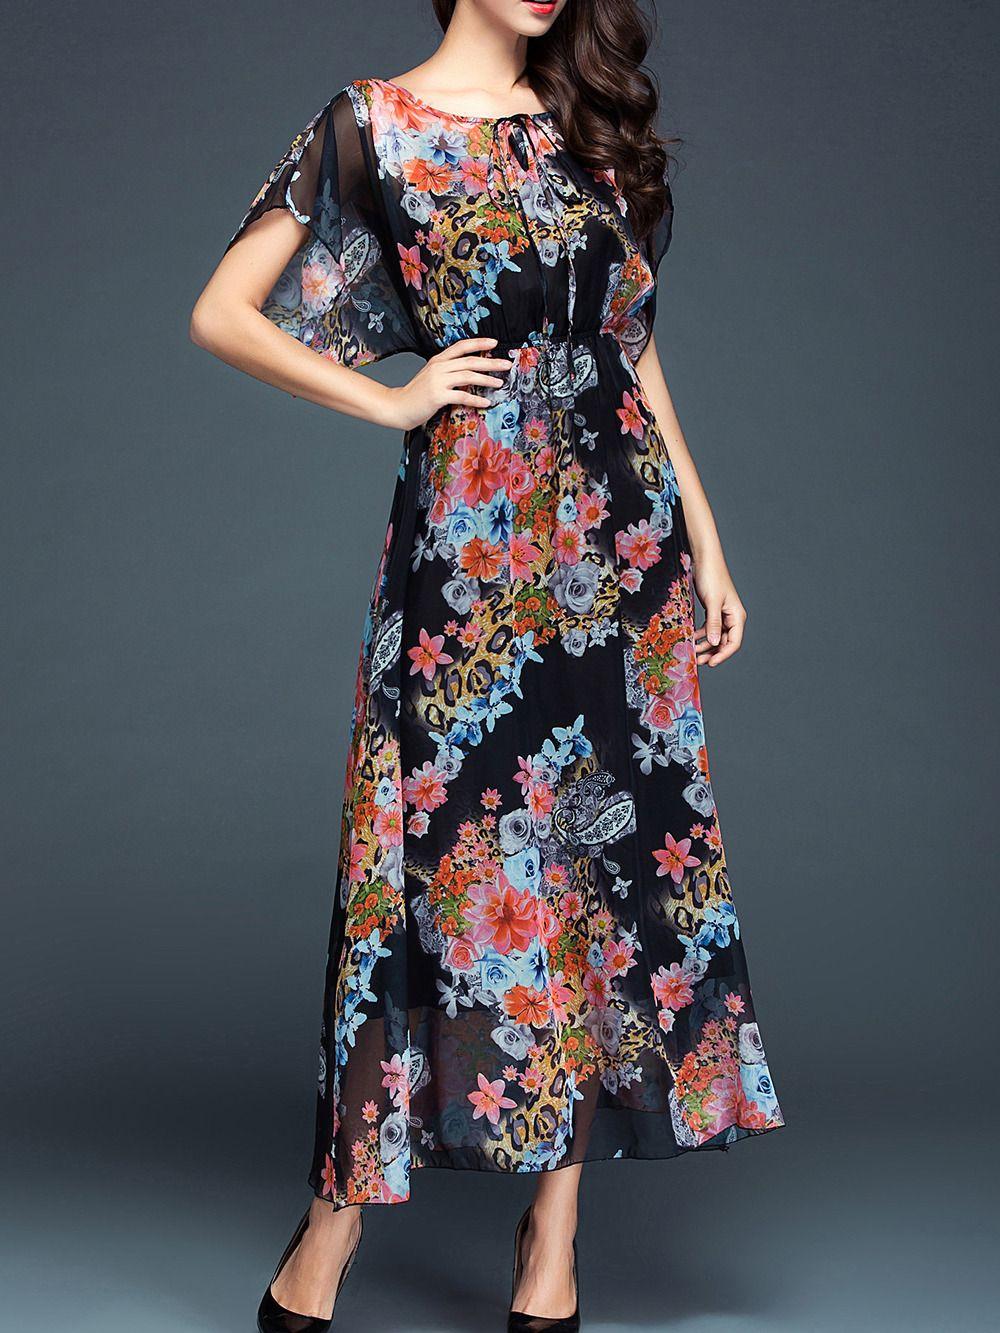 c230208642 Black Tie Neck Batwing Print Maxi Dress -SheIn(abaday)